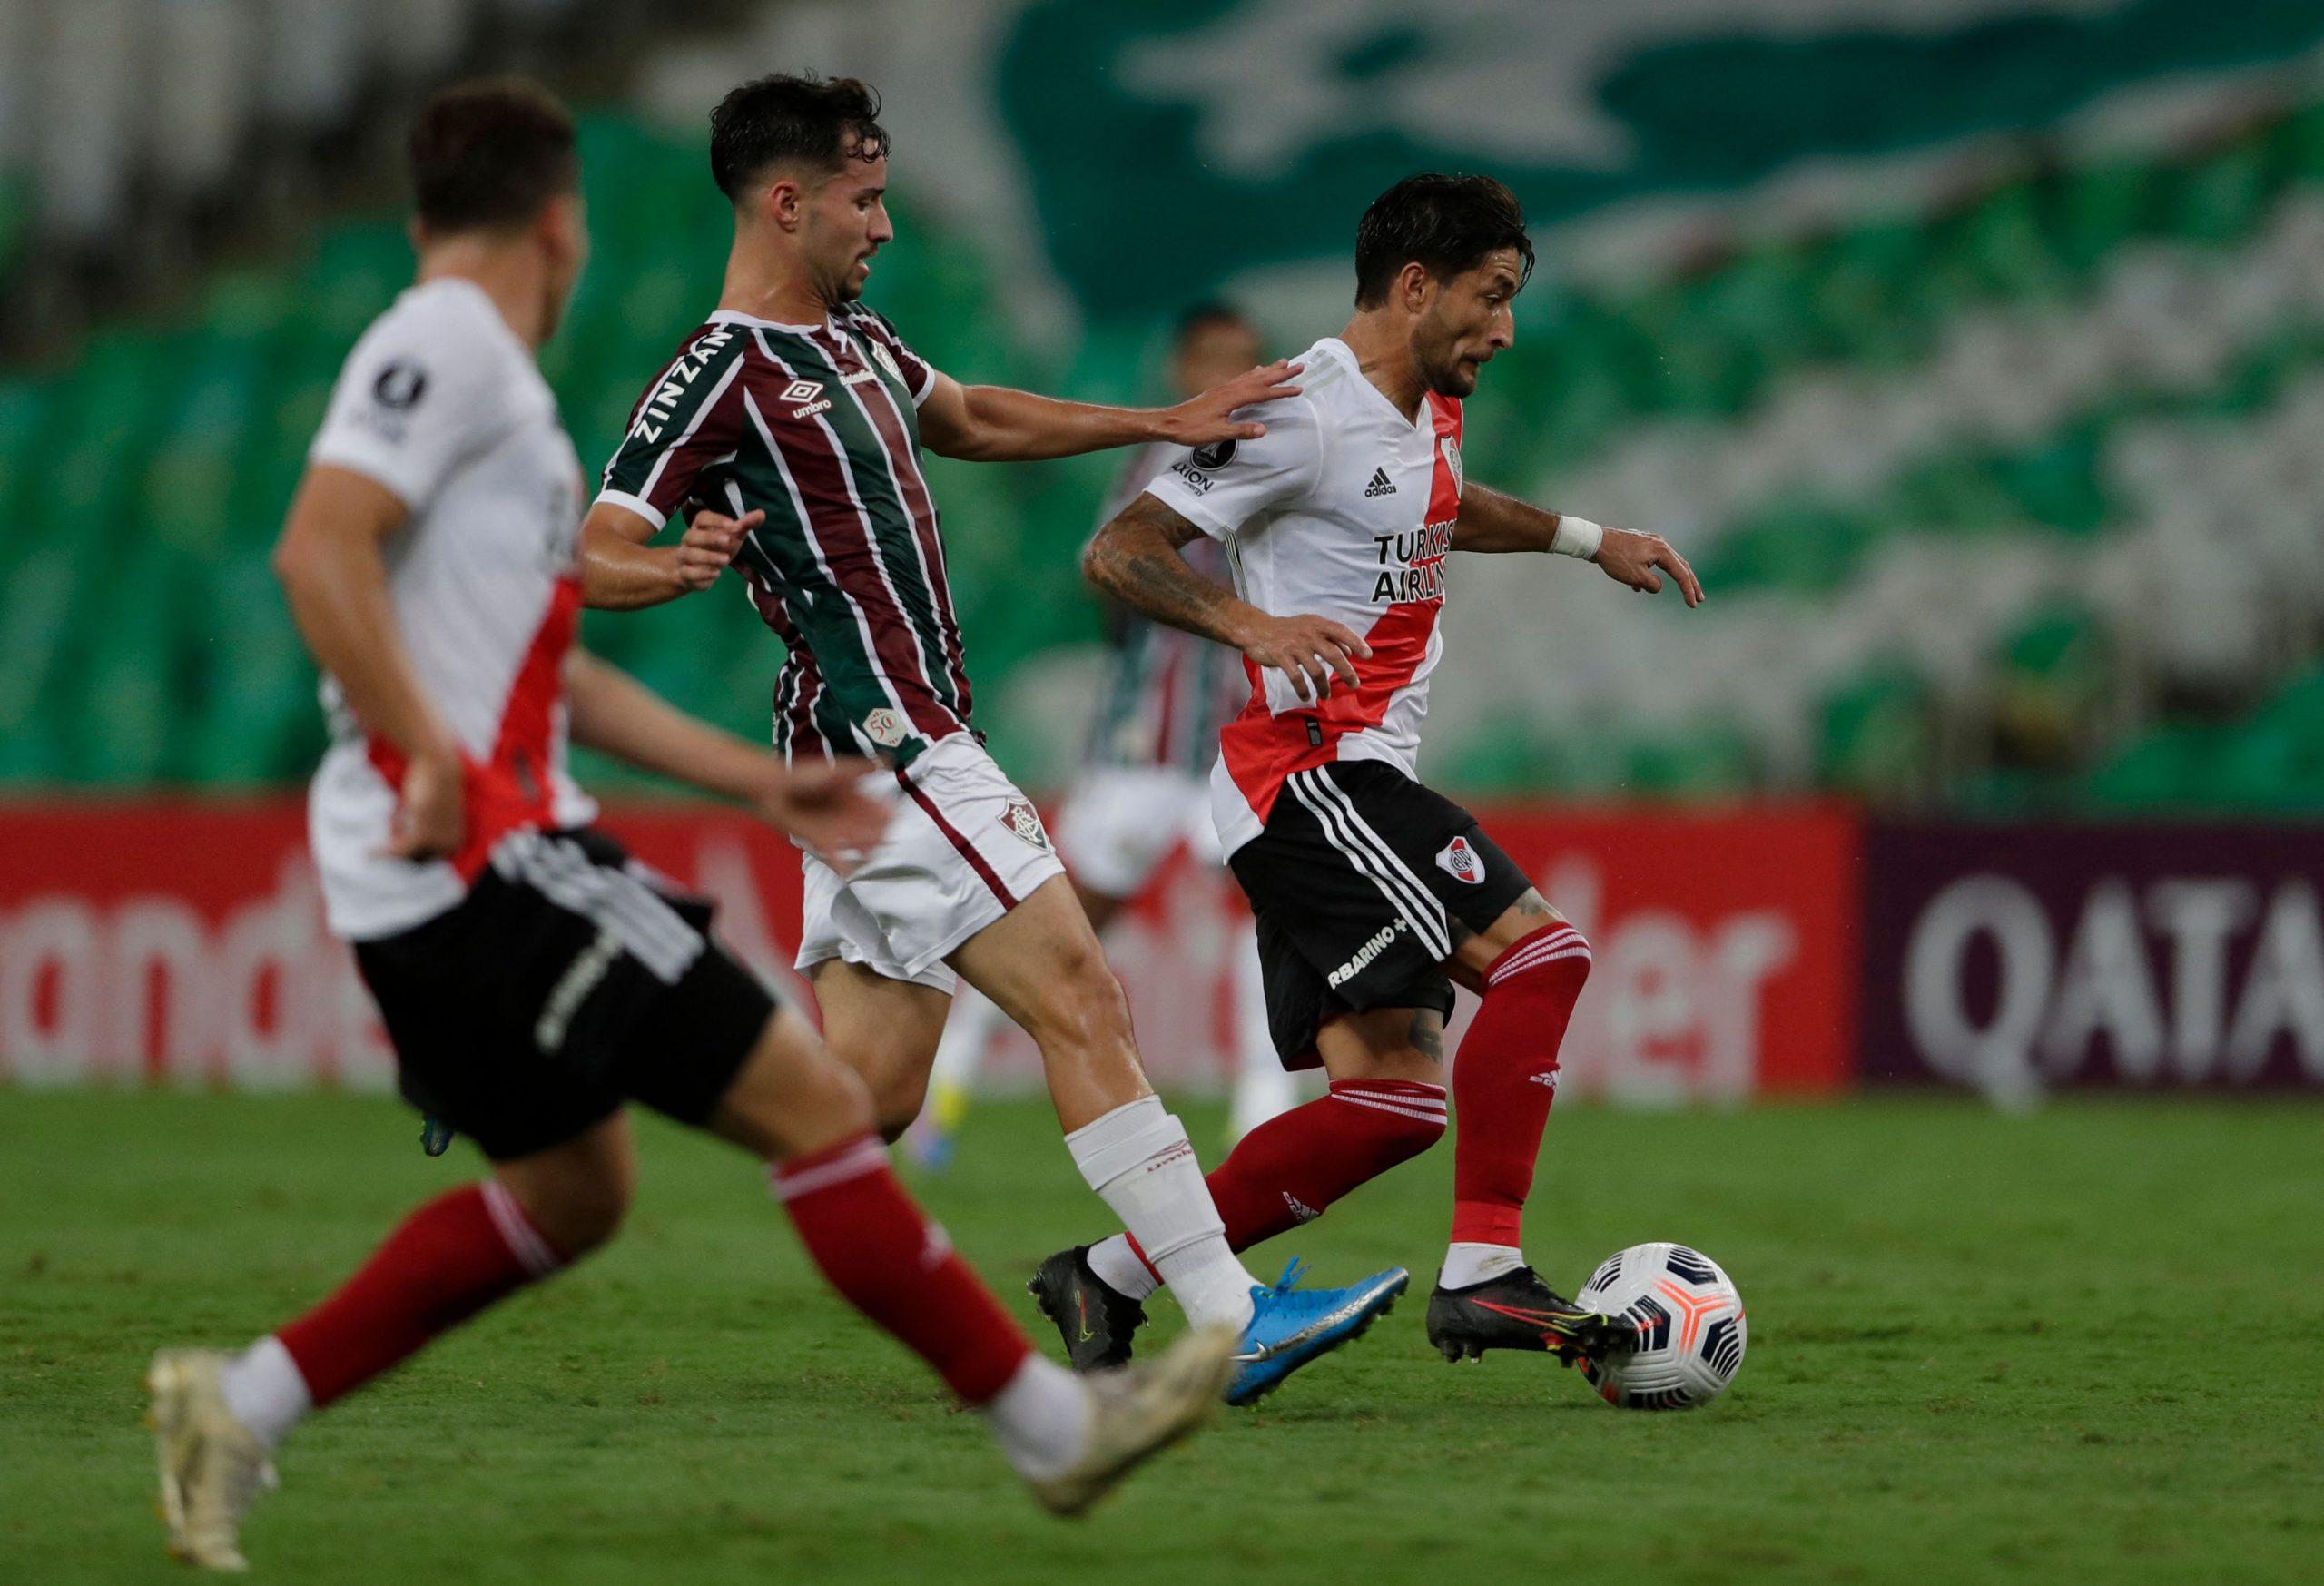 Empate entre Fluminense y River: camino libre para que Santa Fe o Junior saquen ventaja